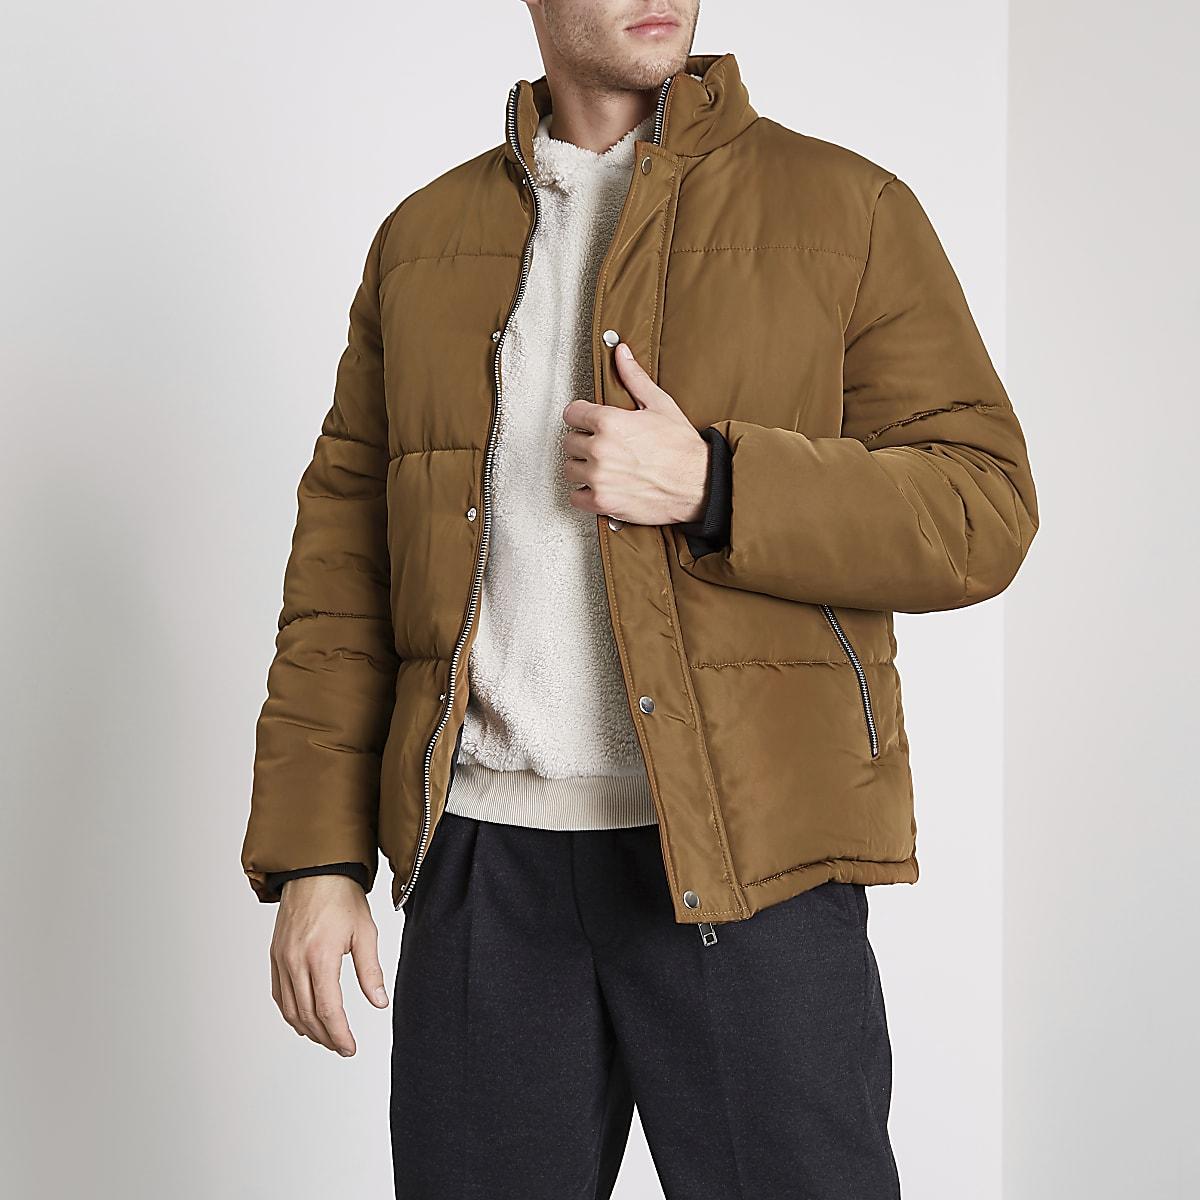 Brown puffer jacket